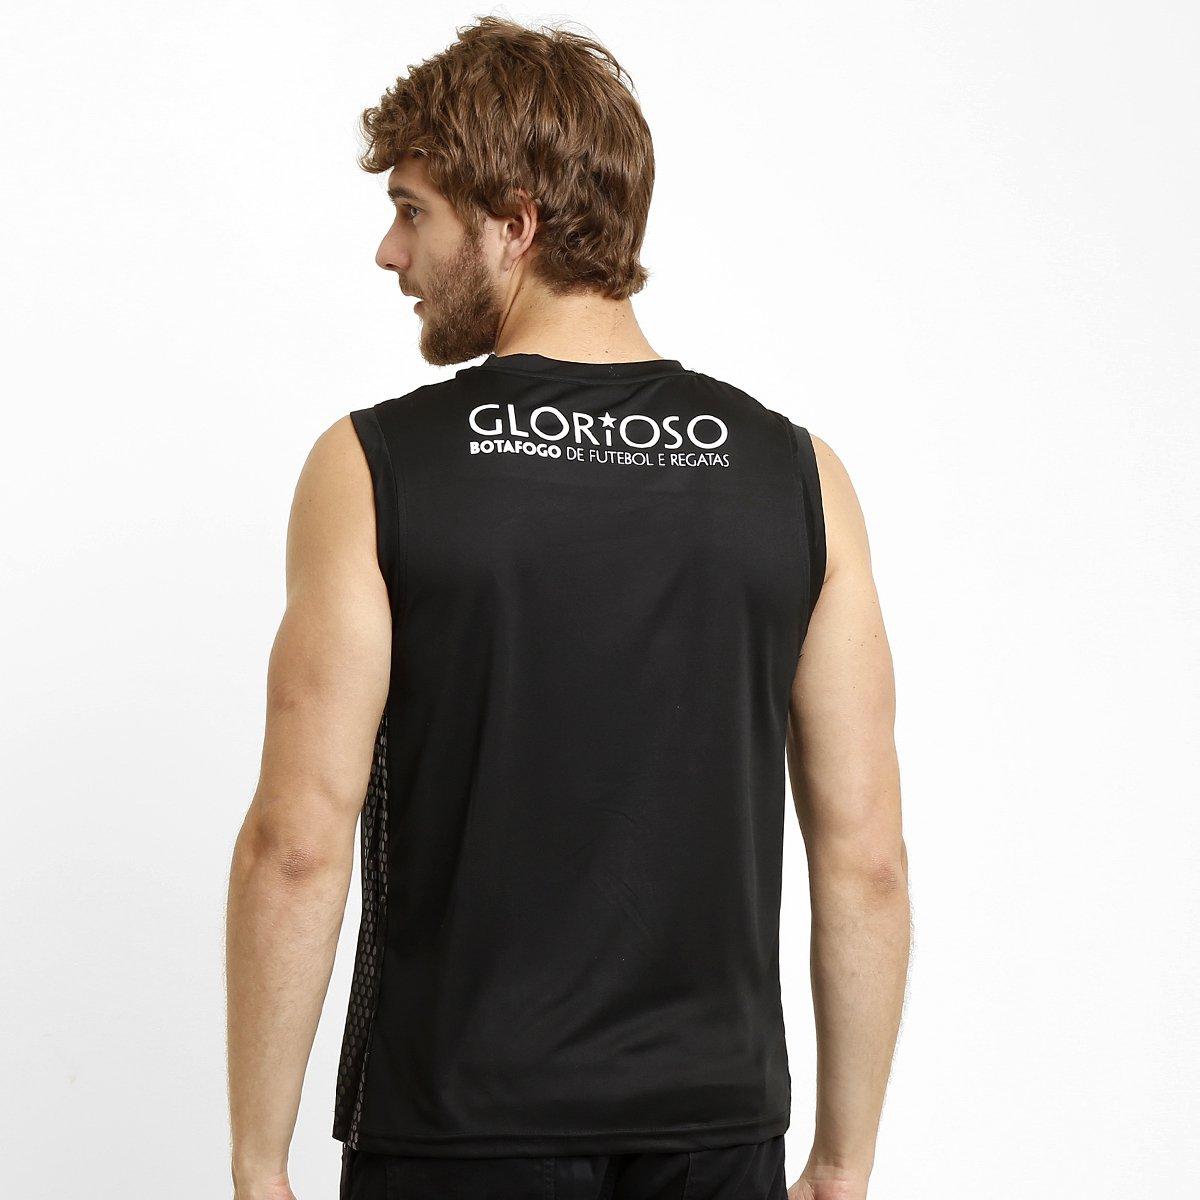 Camiseta Regata Botafogo  Camiseta Regata Botafogo ... 14fbb23567579